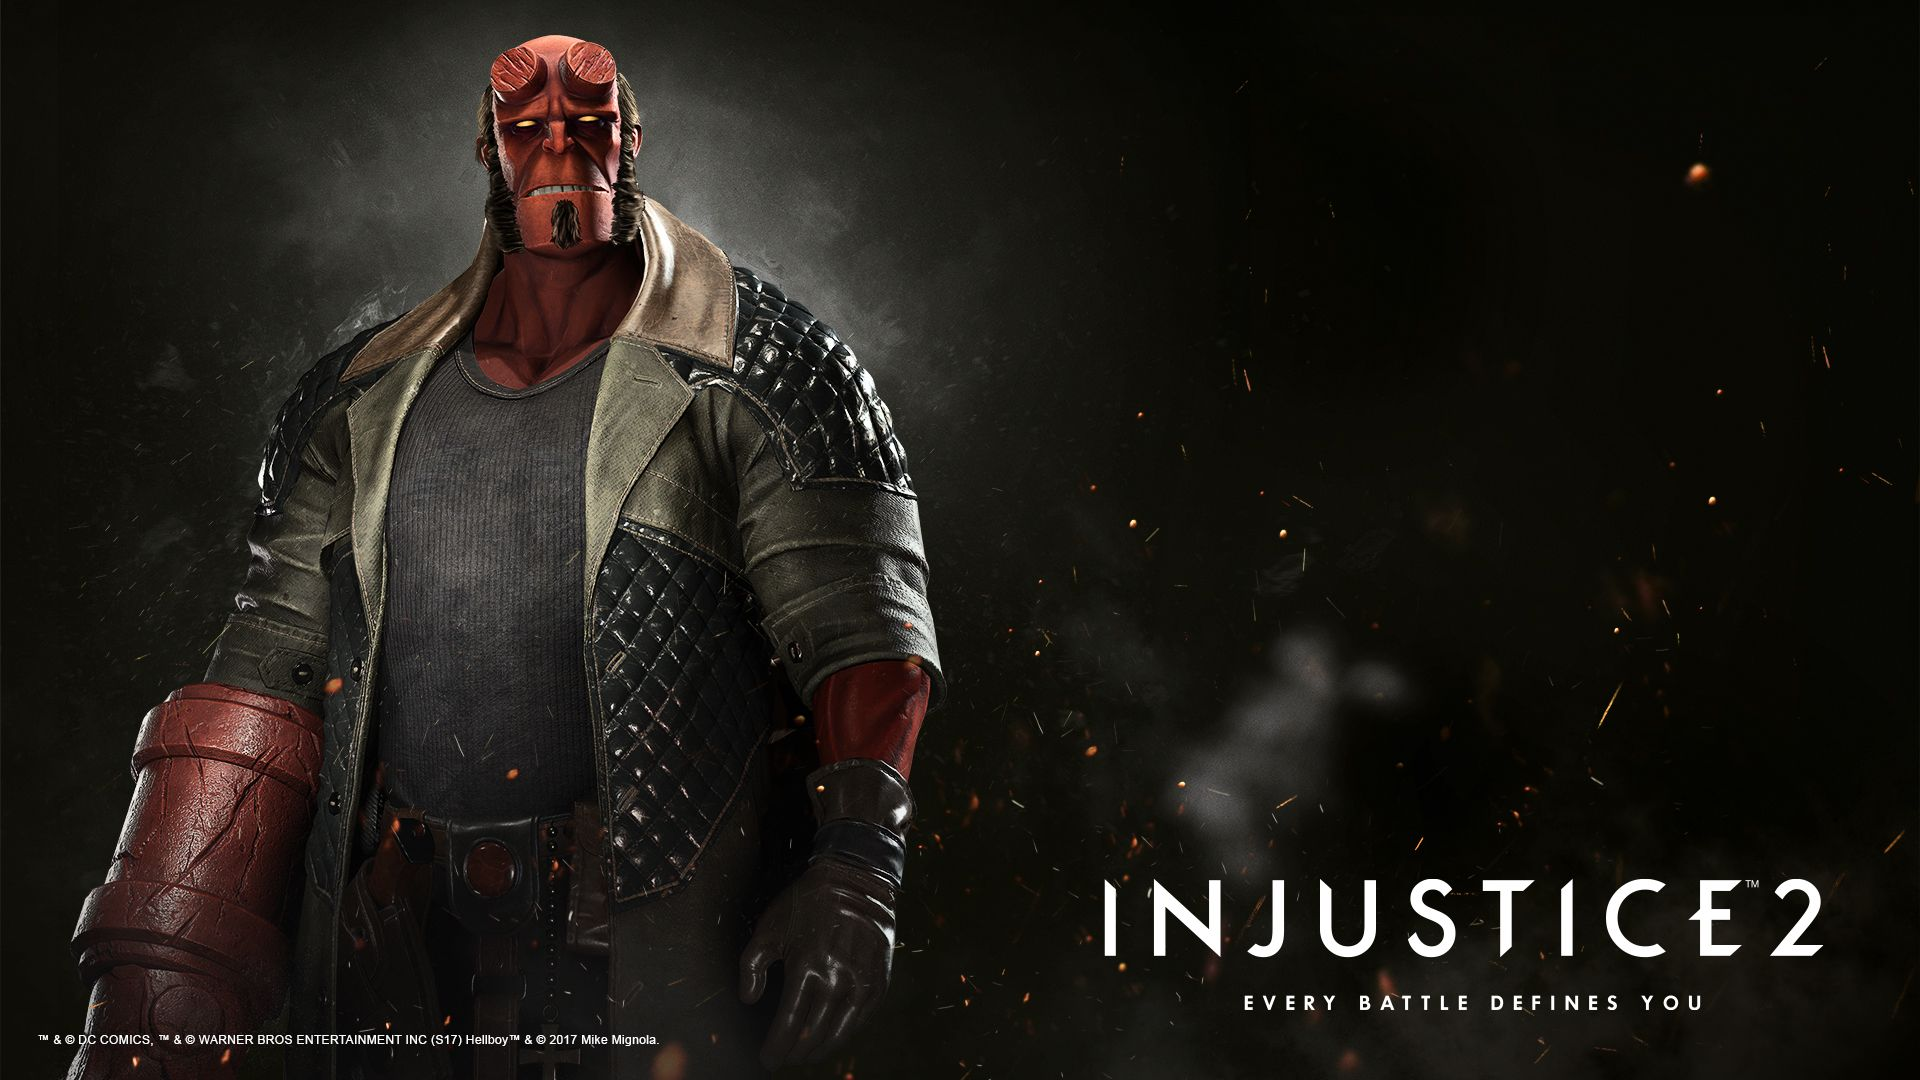 Image injustice2 hellboy wallpaper 1920x1080 96g injustice injustice2 hellboy wallpaper 1920x1080 96g voltagebd Choice Image